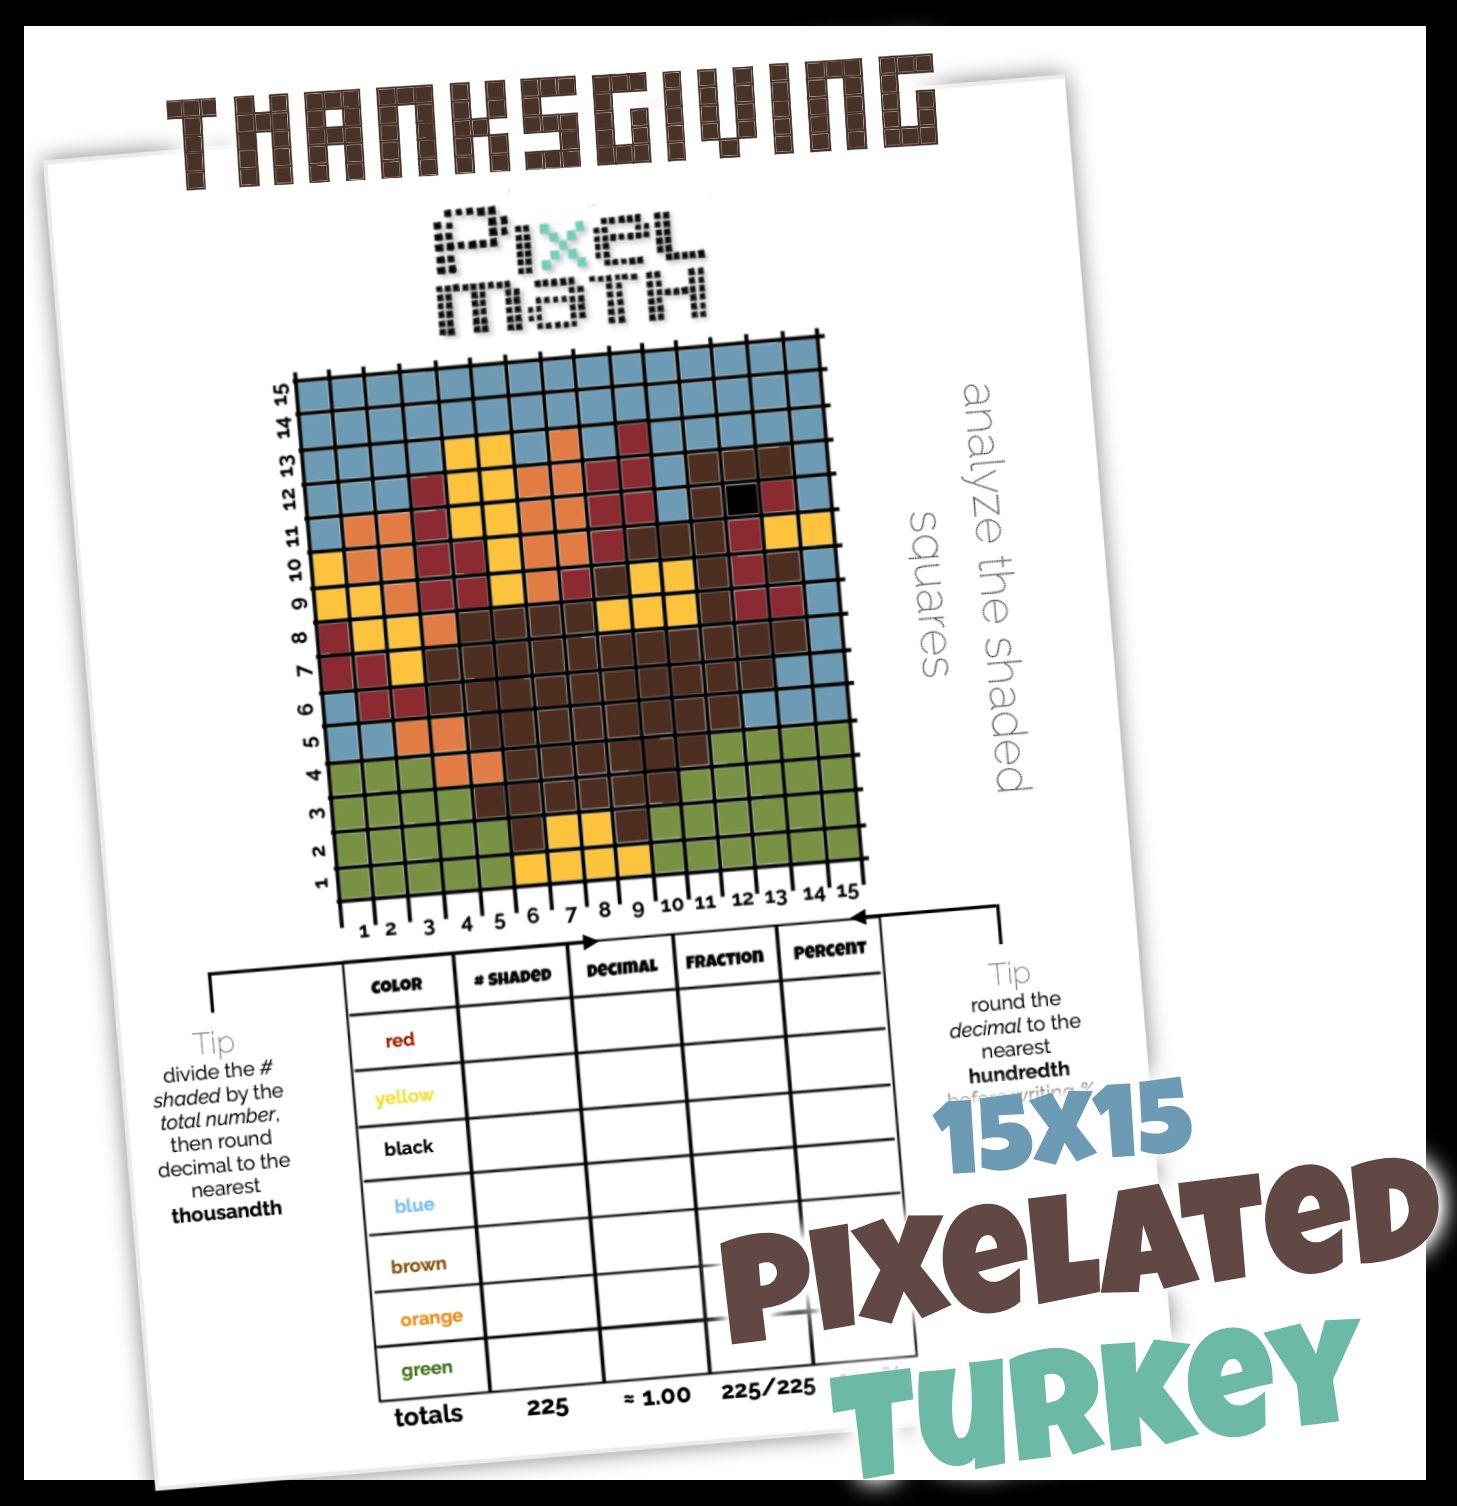 Thanksgiving Turkey Pixel Art 15x15 Challenging Practice With Fractions Decimal Percent Pixel Turkey Math Fractions [ 1506 x 1457 Pixel ]